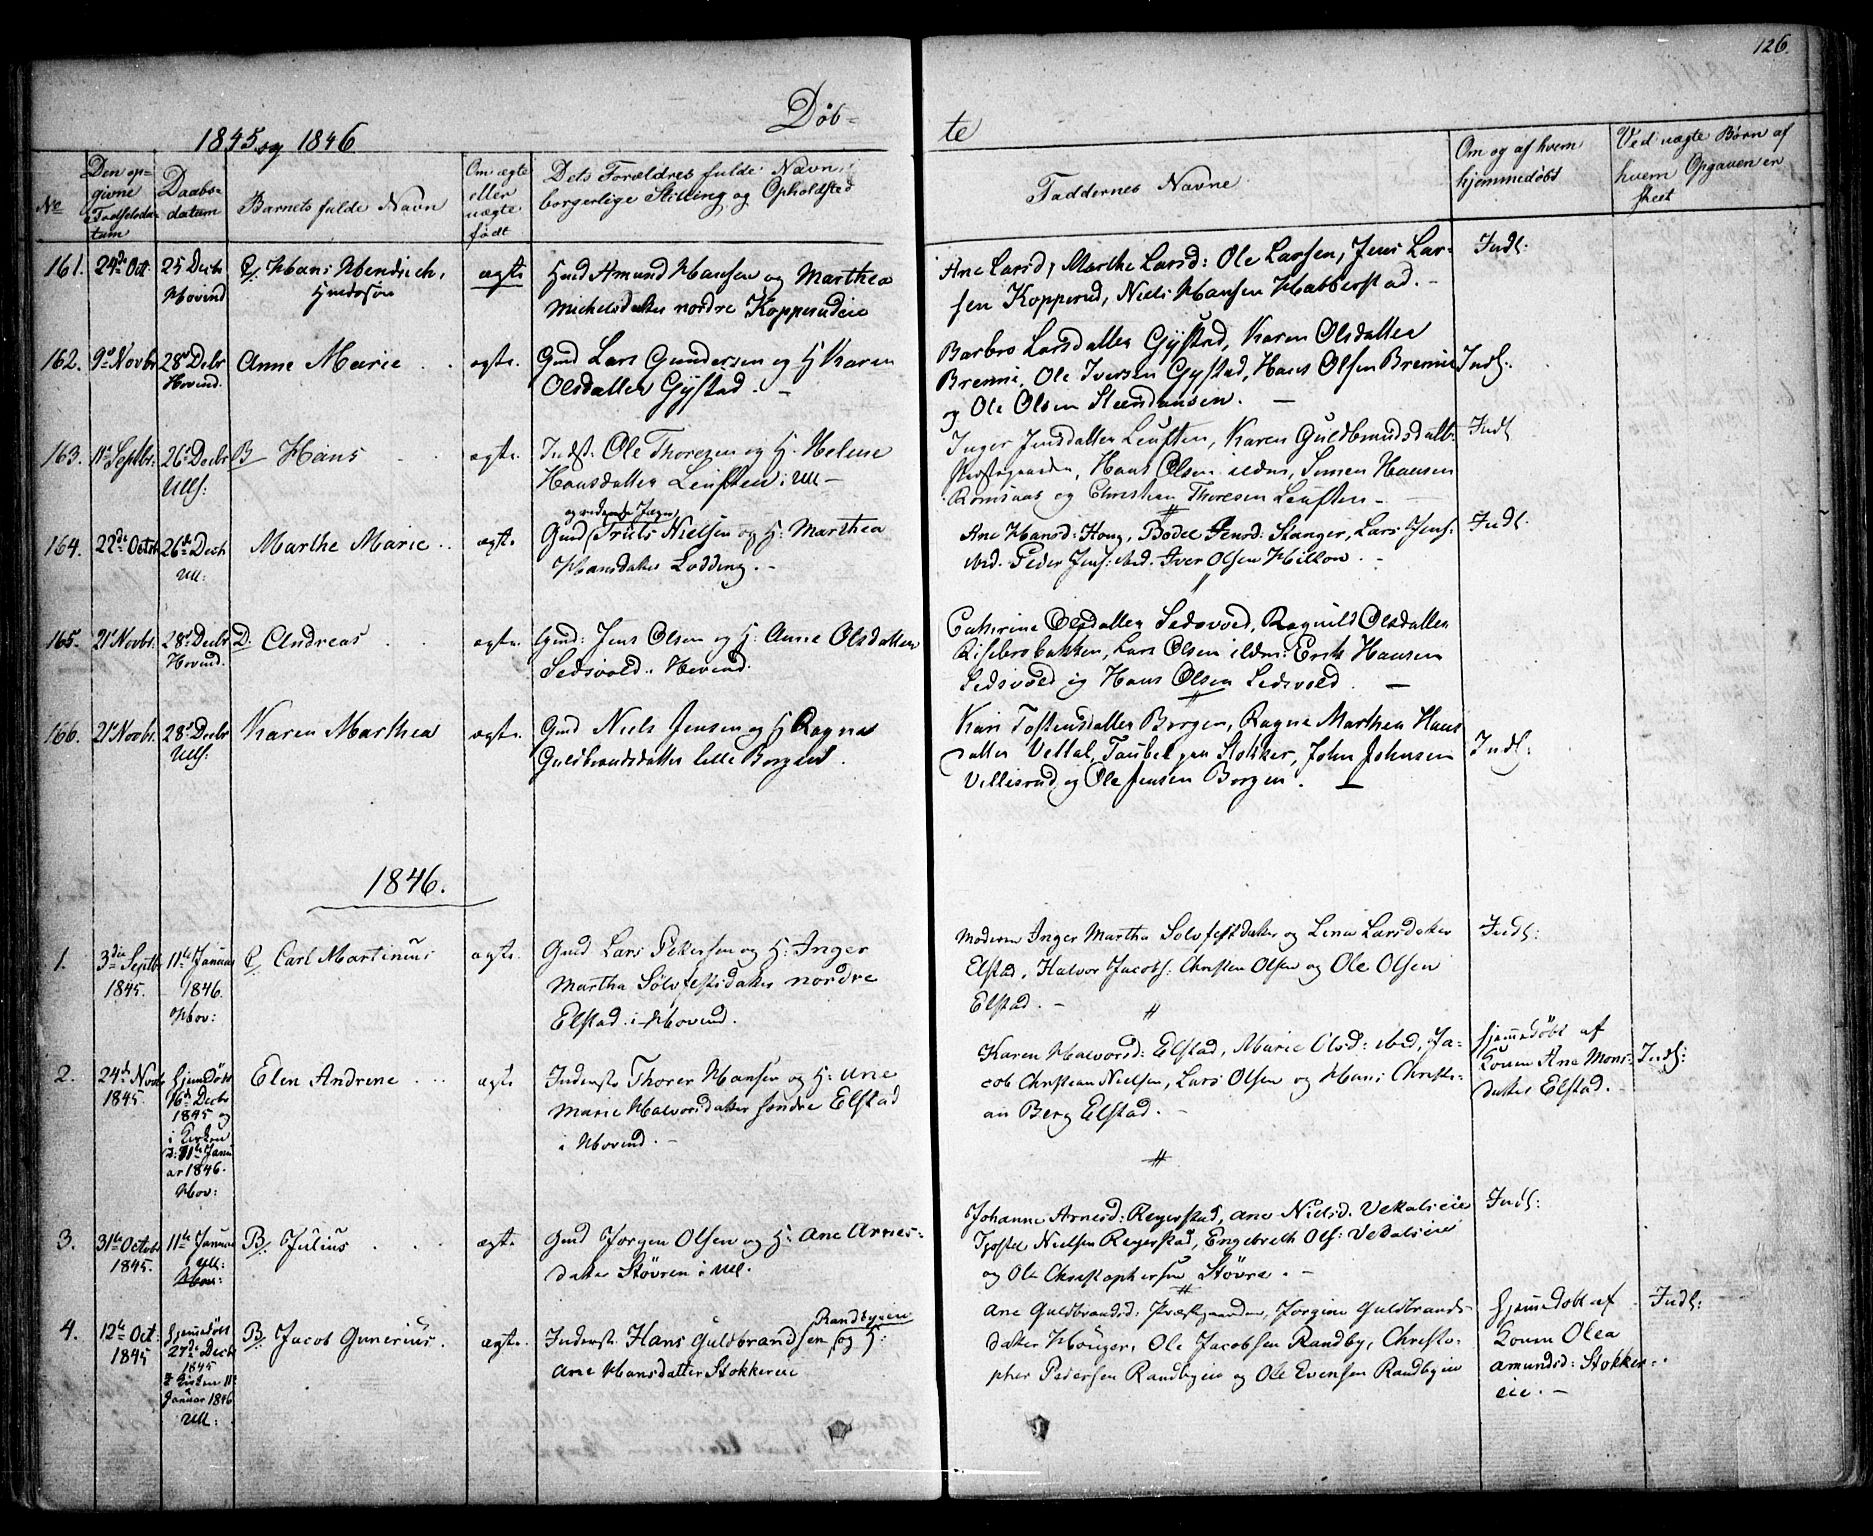 SAO, Ullensaker prestekontor Kirkebøker, F/Fa/L0014.a: Ministerialbok nr. I 14A, 1836-1850, s. 126